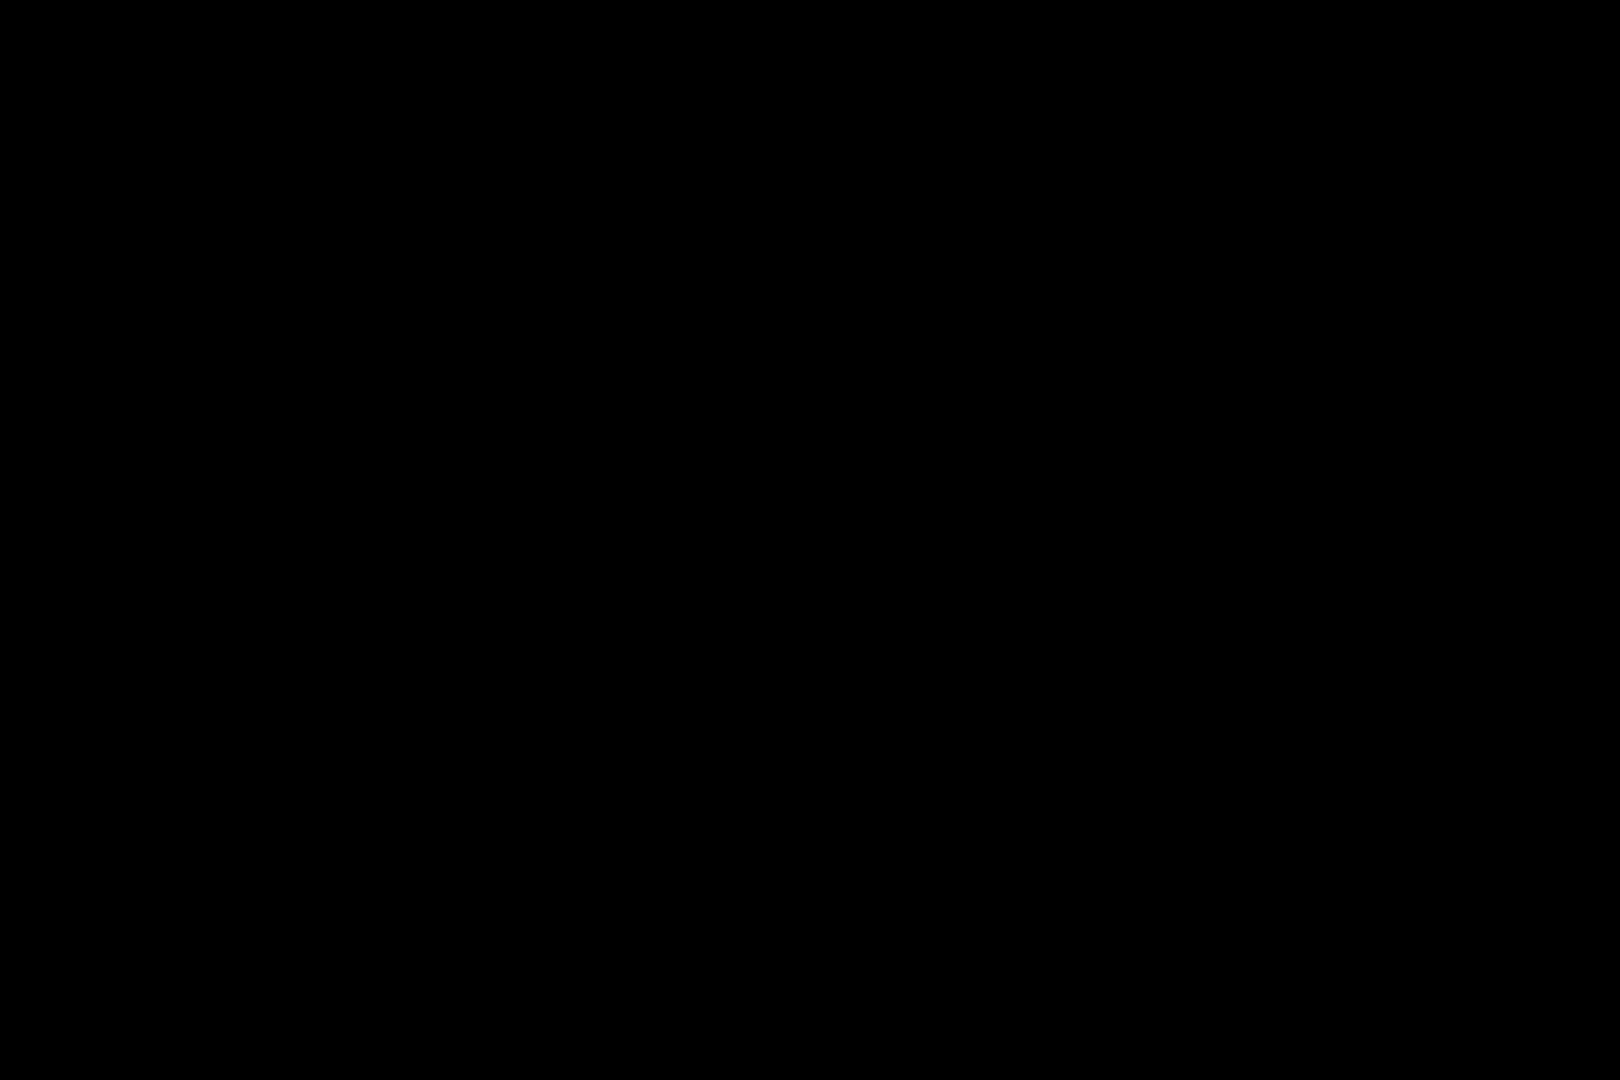 充血監督の深夜の運動会Vol.124 赤外線 盗撮オマンコ無修正動画無料 63画像 59